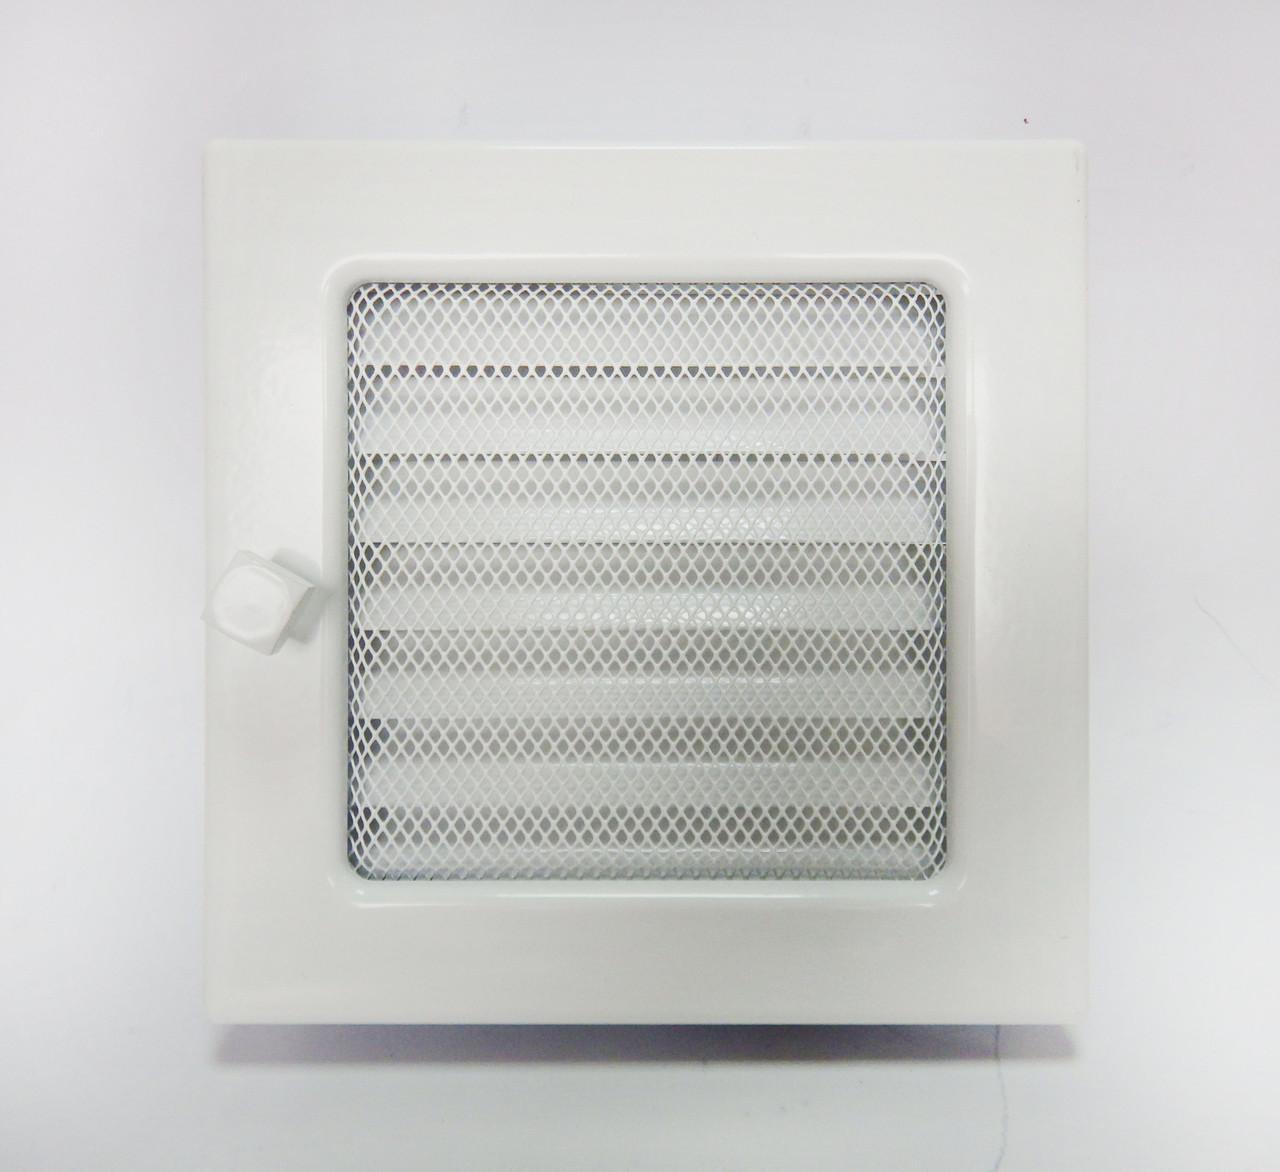 Решетка для камина с жалюзи, 22х22 см